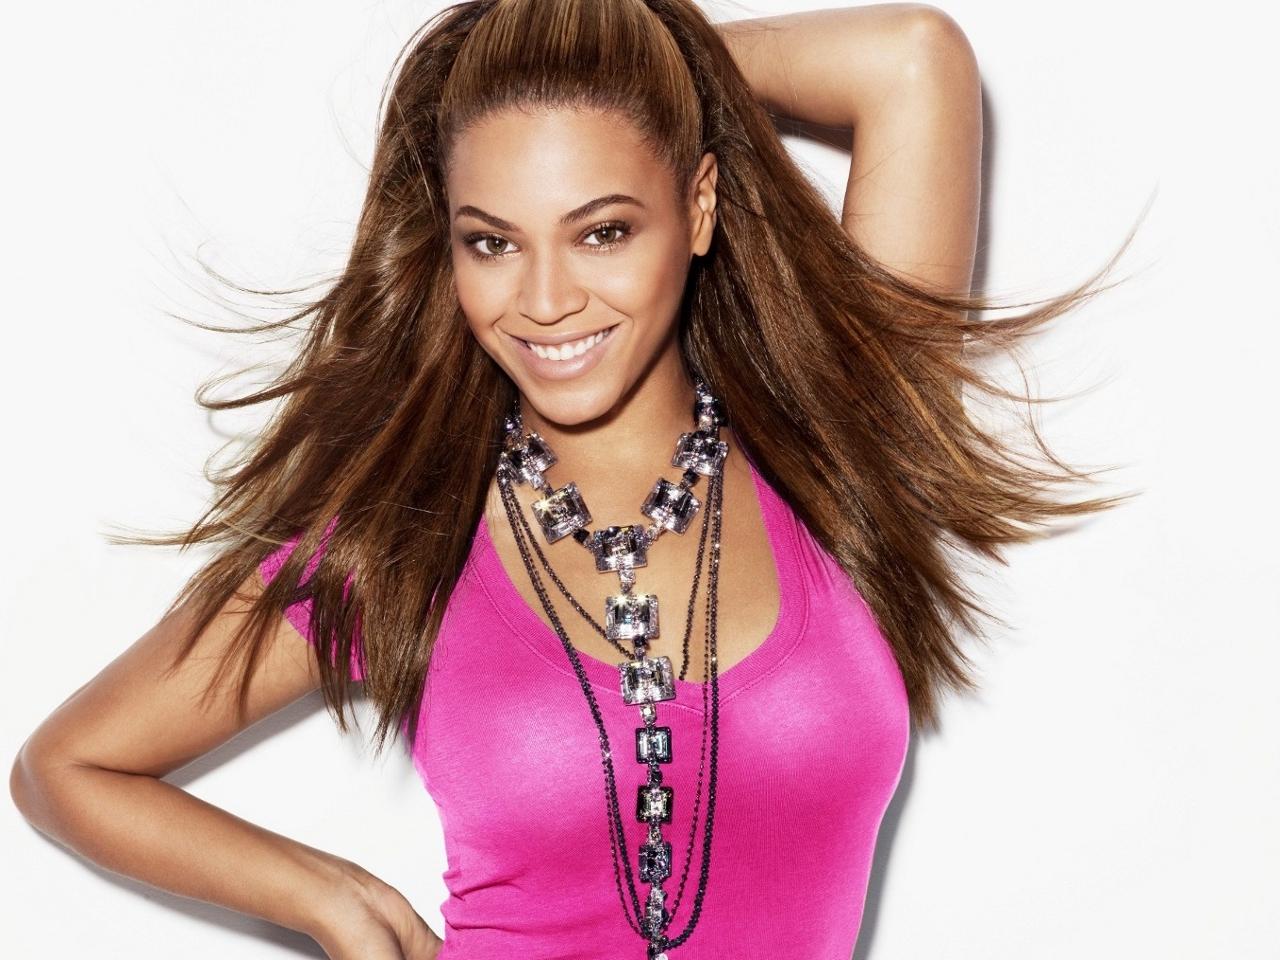 http://2.bp.blogspot.com/-RmeVox0Val4/UOoHxYqGMBI/AAAAAAAAF4k/0K6Vs3lNajI/s1600/Beyonce+resmi.jpg